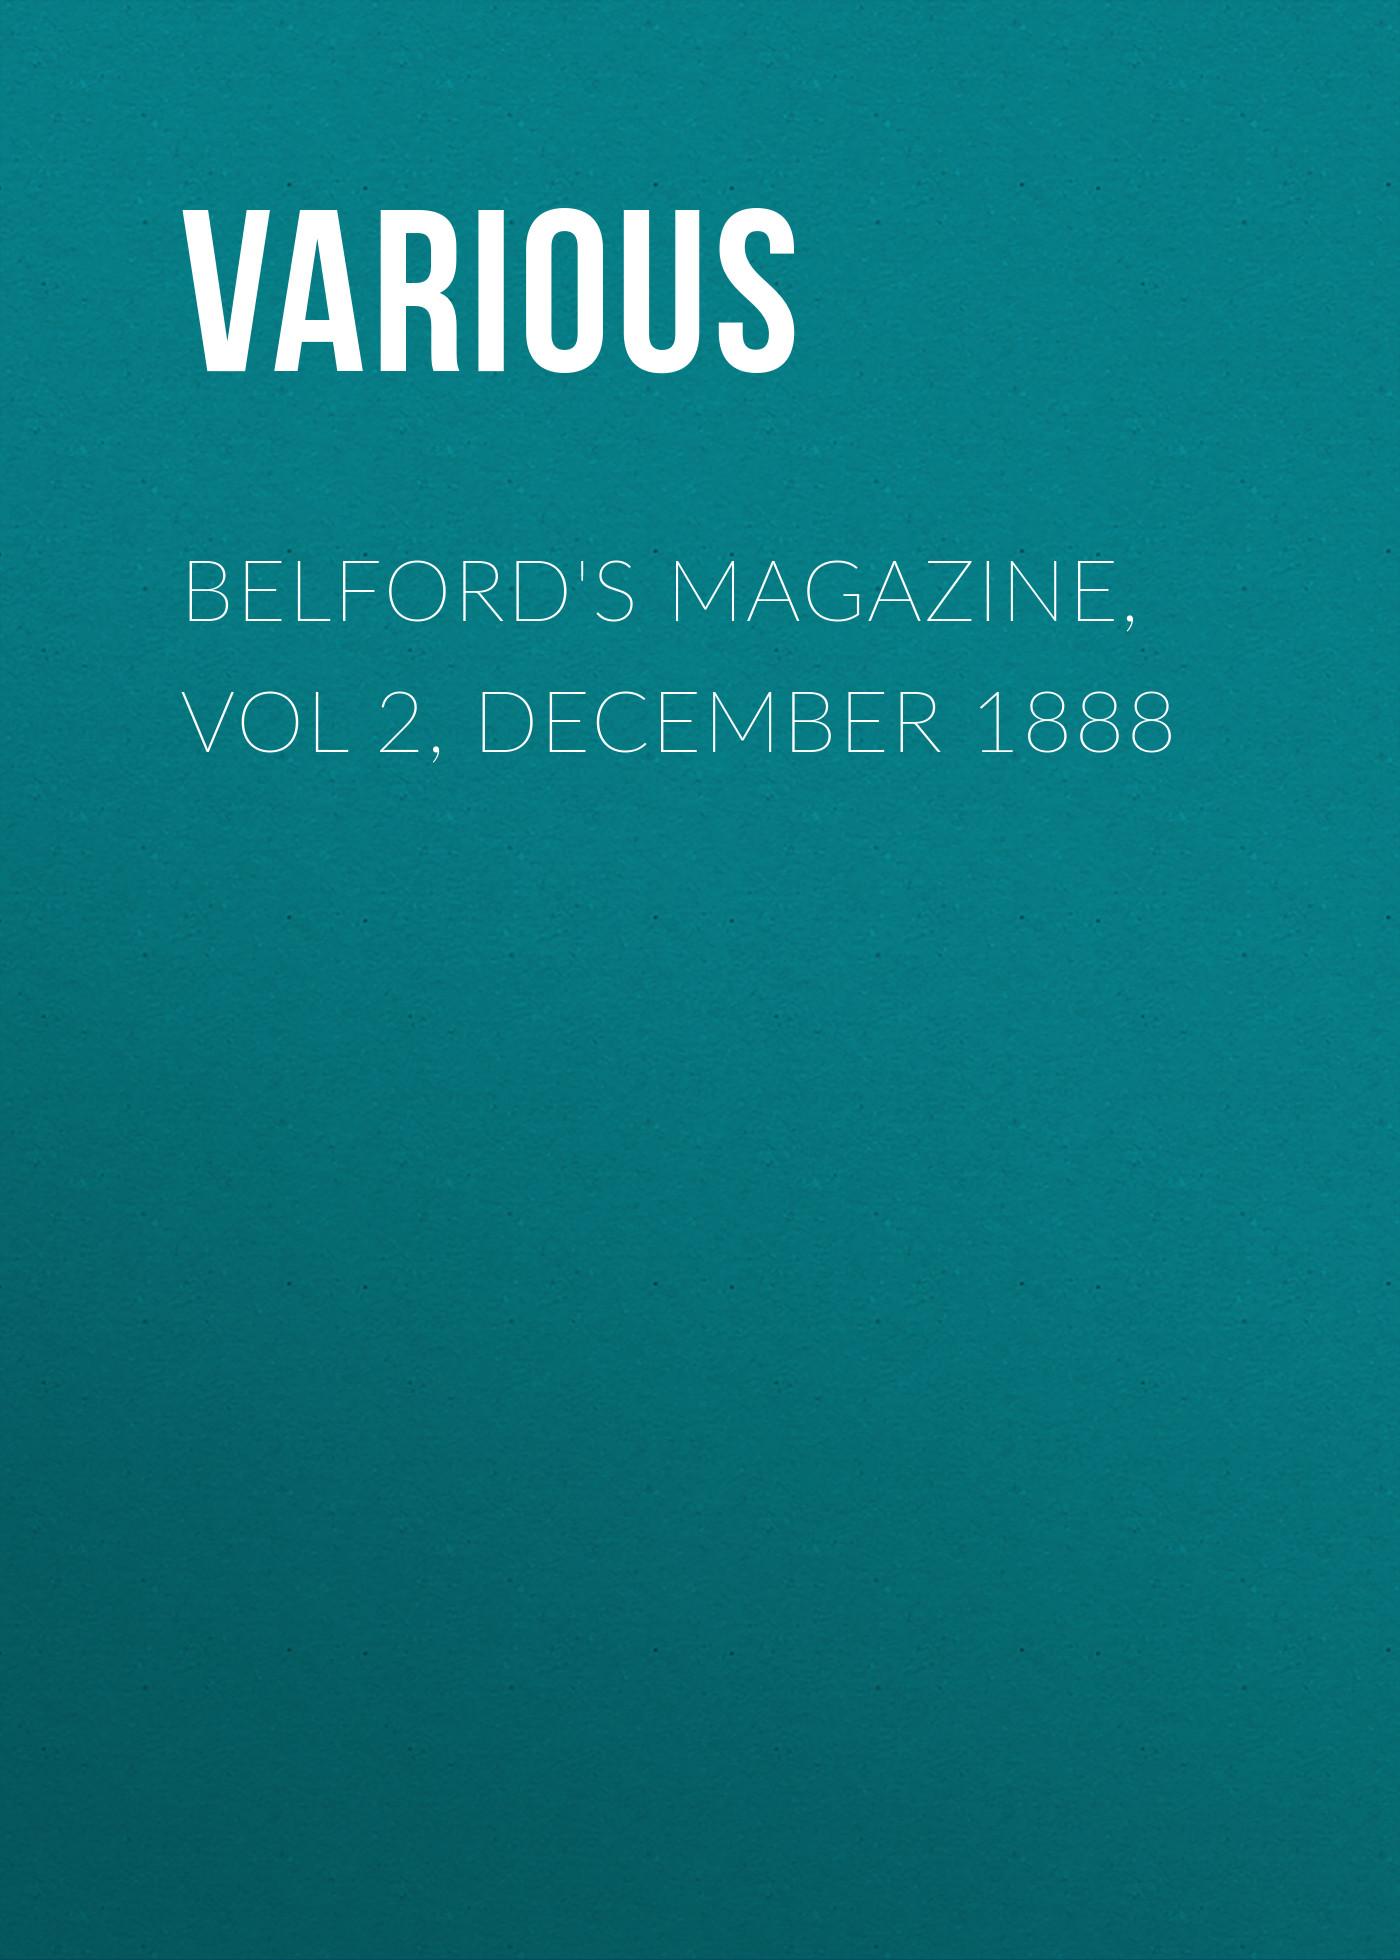 Various Belford's Magazine, Vol 2, December 1888 powerhouse magazine 5